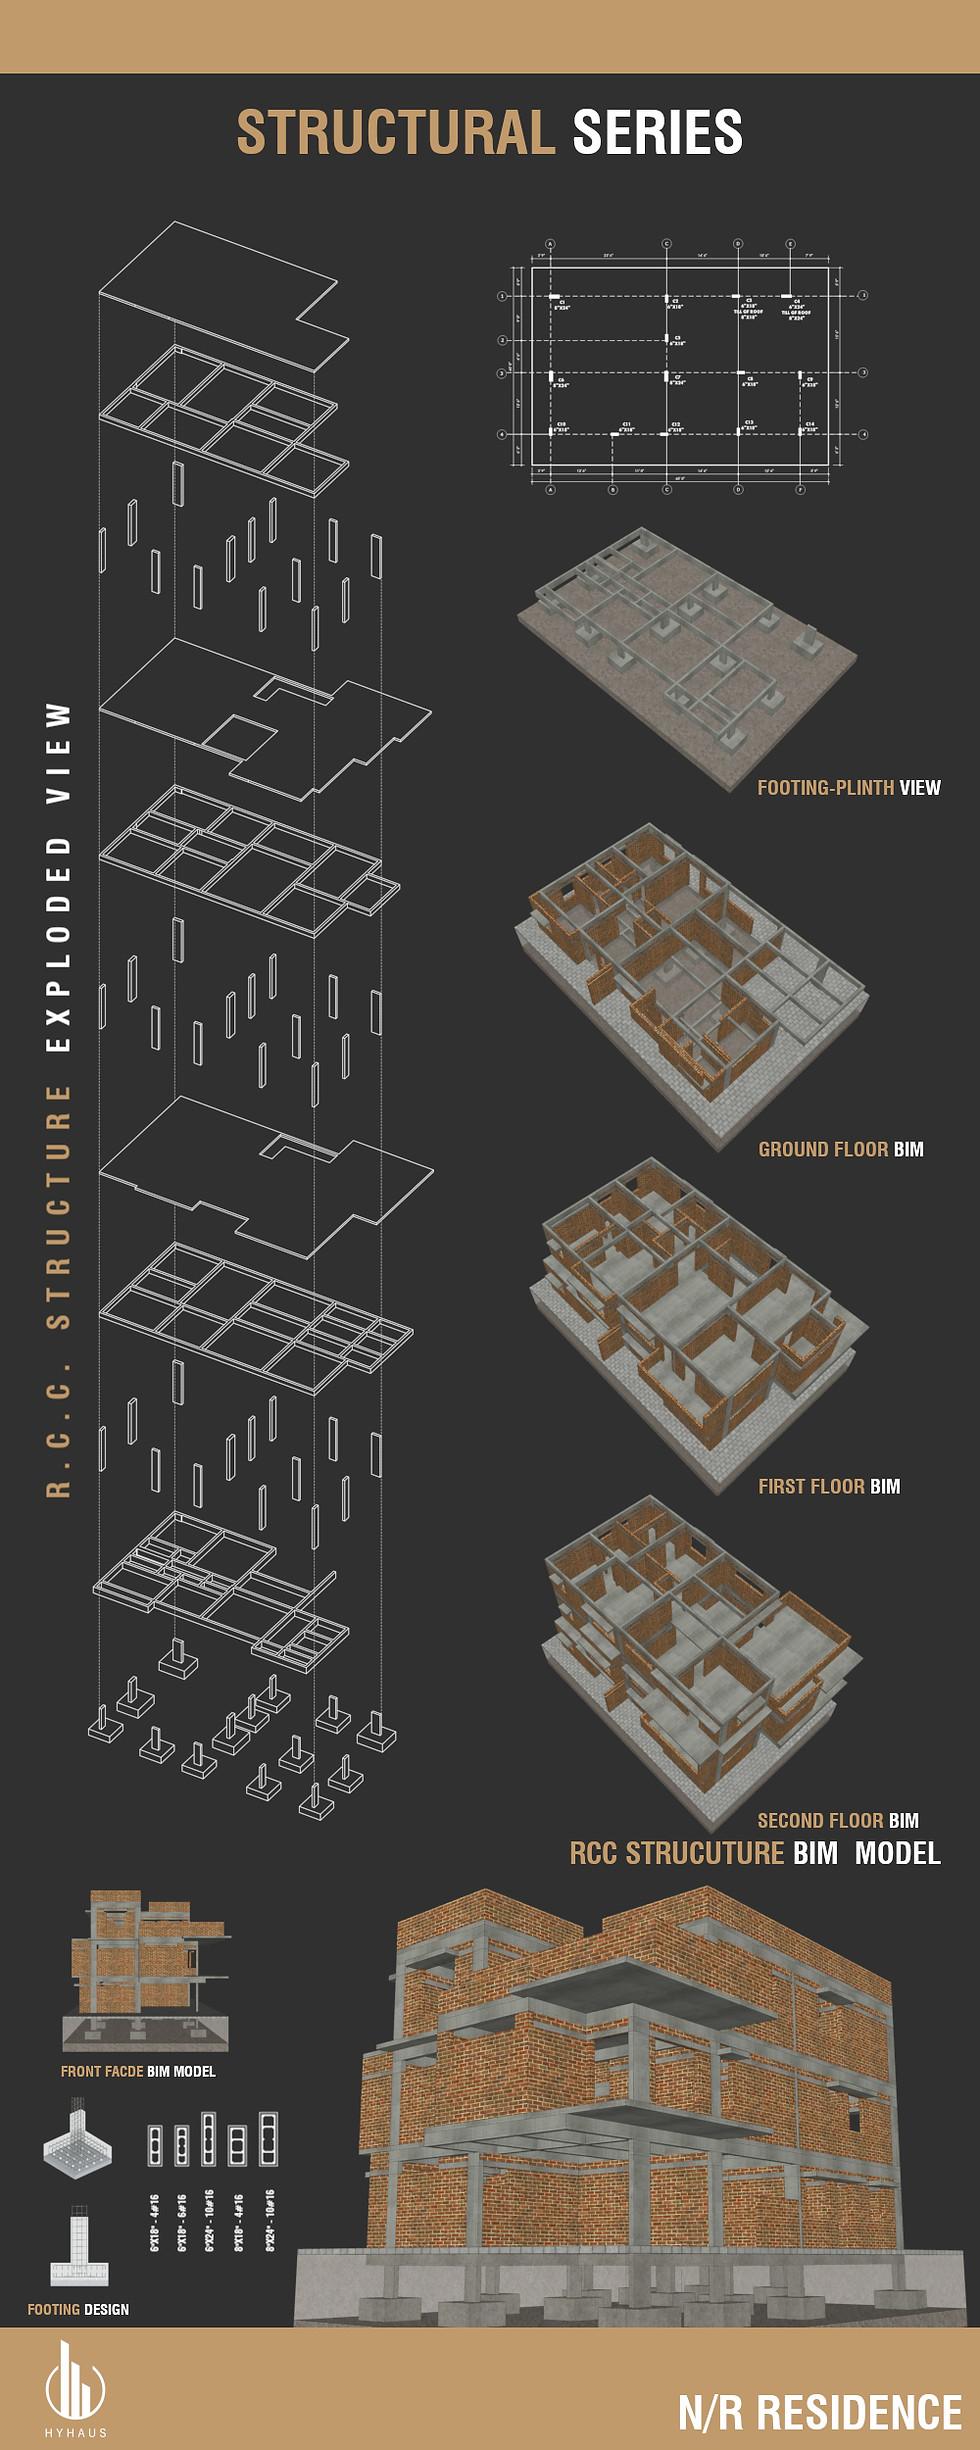 structural series.jpg